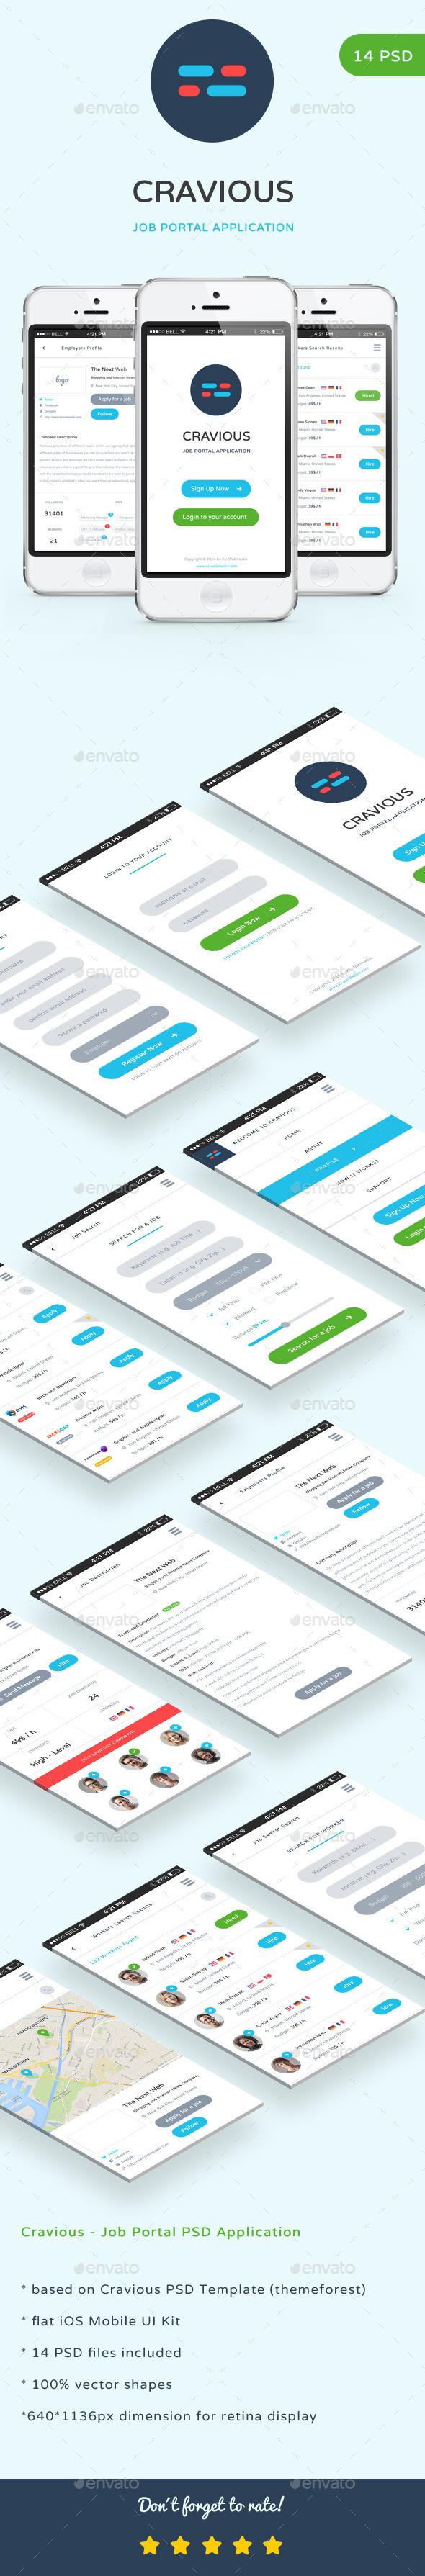 Cravious - Job Portal Application (User Interfaces)